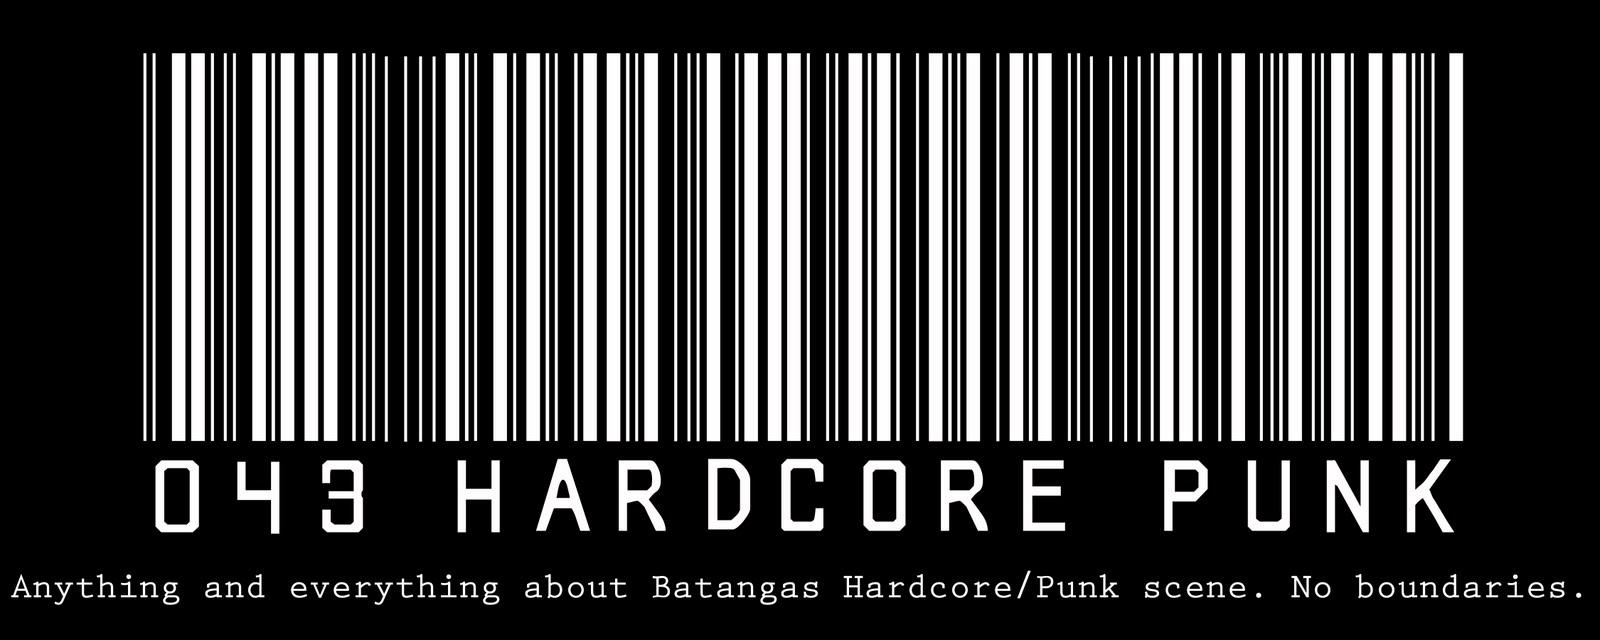 BATANGAS HARDCORE/PUNK